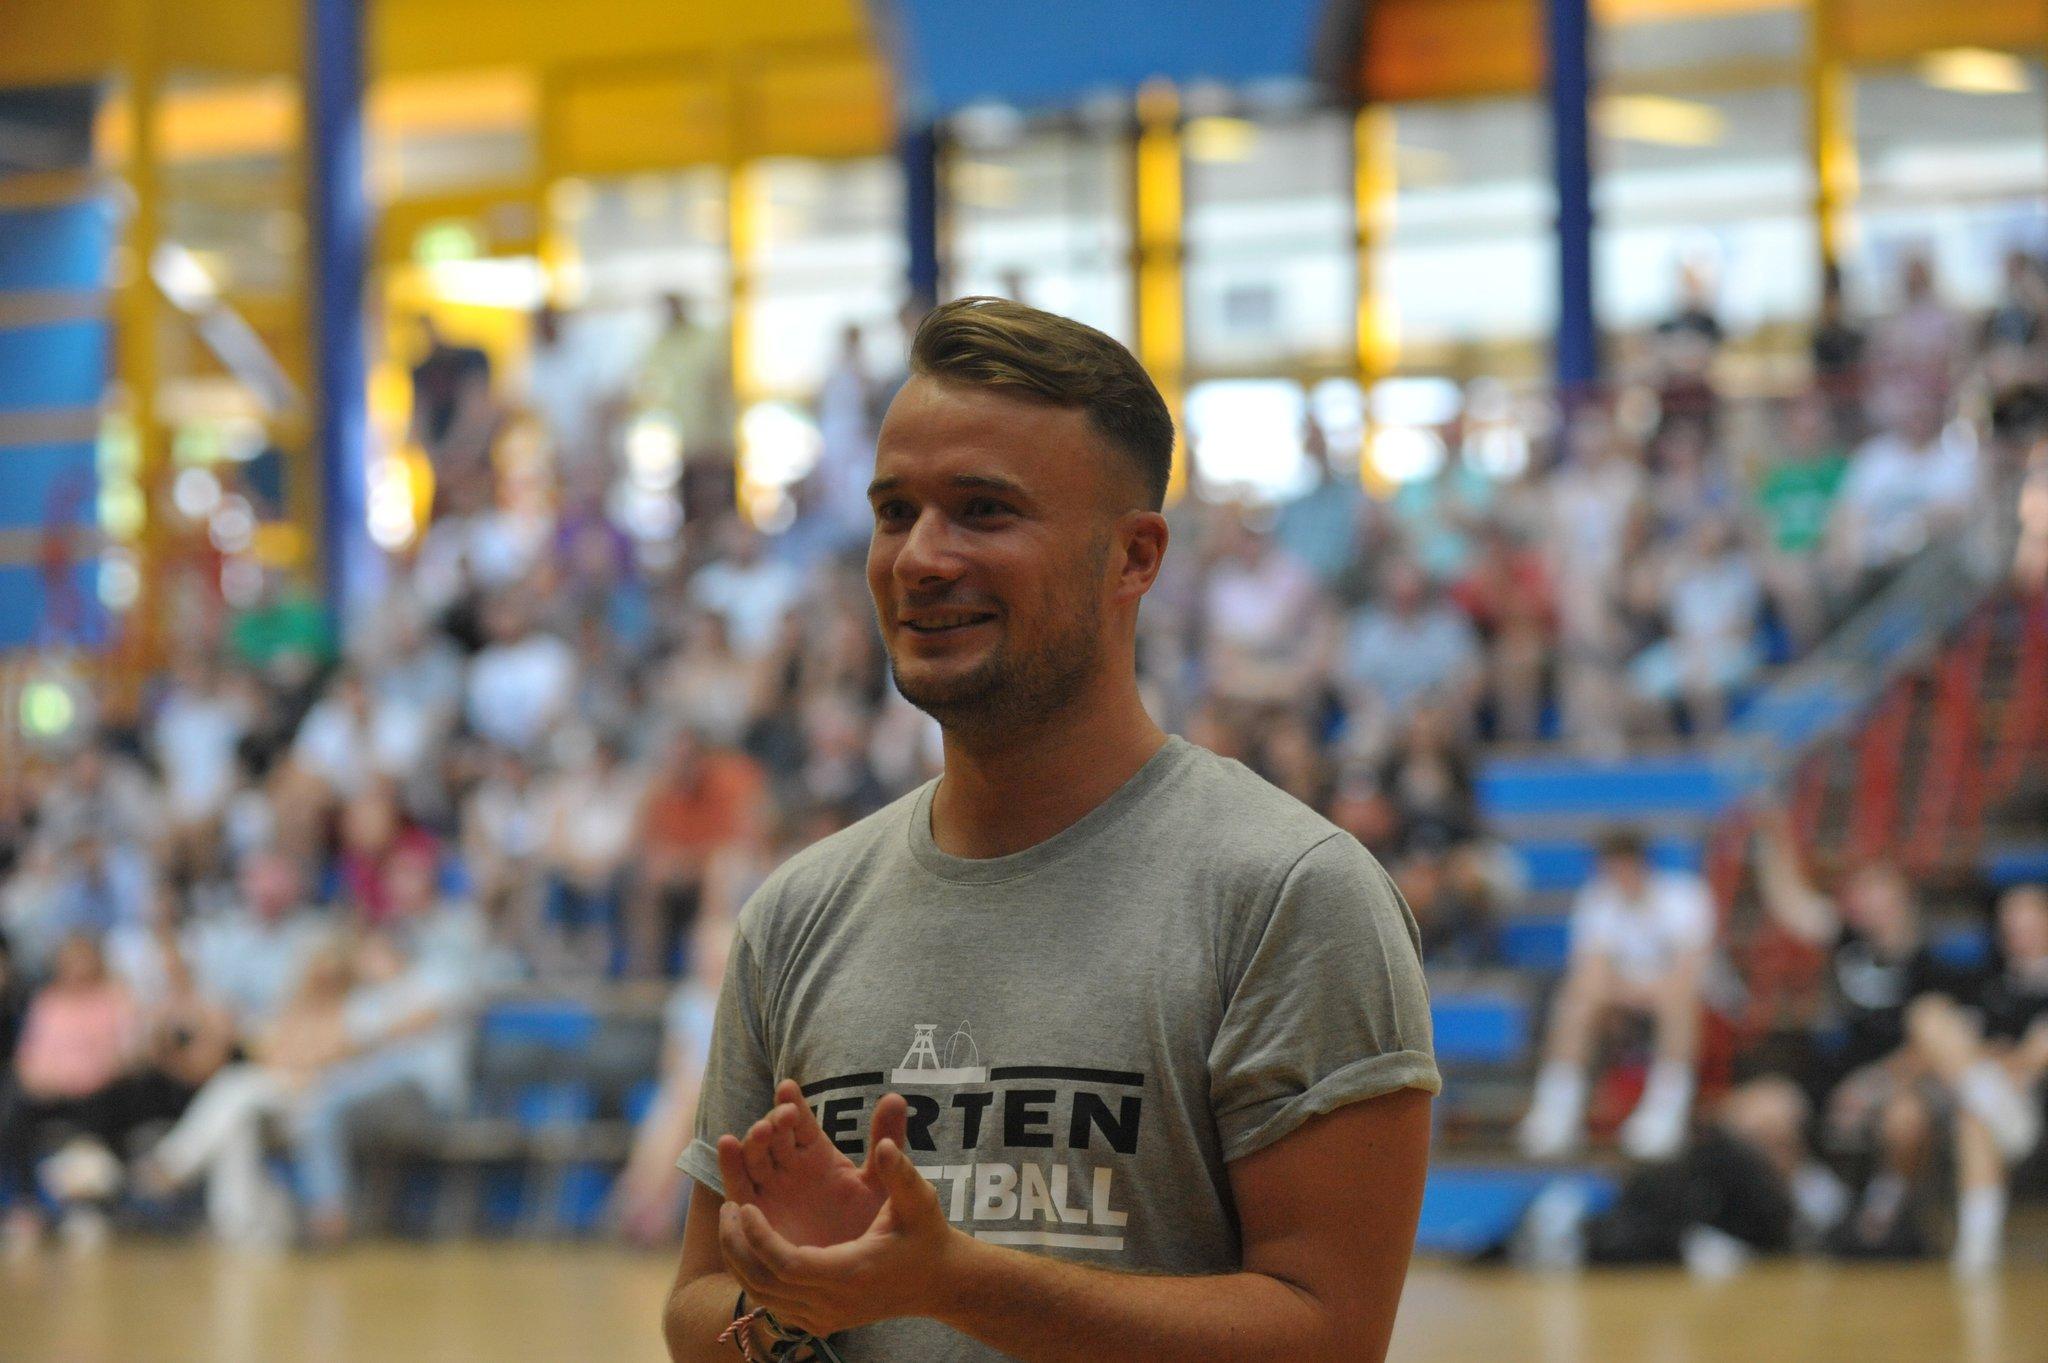 Basketballer zu Gast beim Tabellenzweiten: Löwen erwartetschweres Spiel - Lokalkompass.de